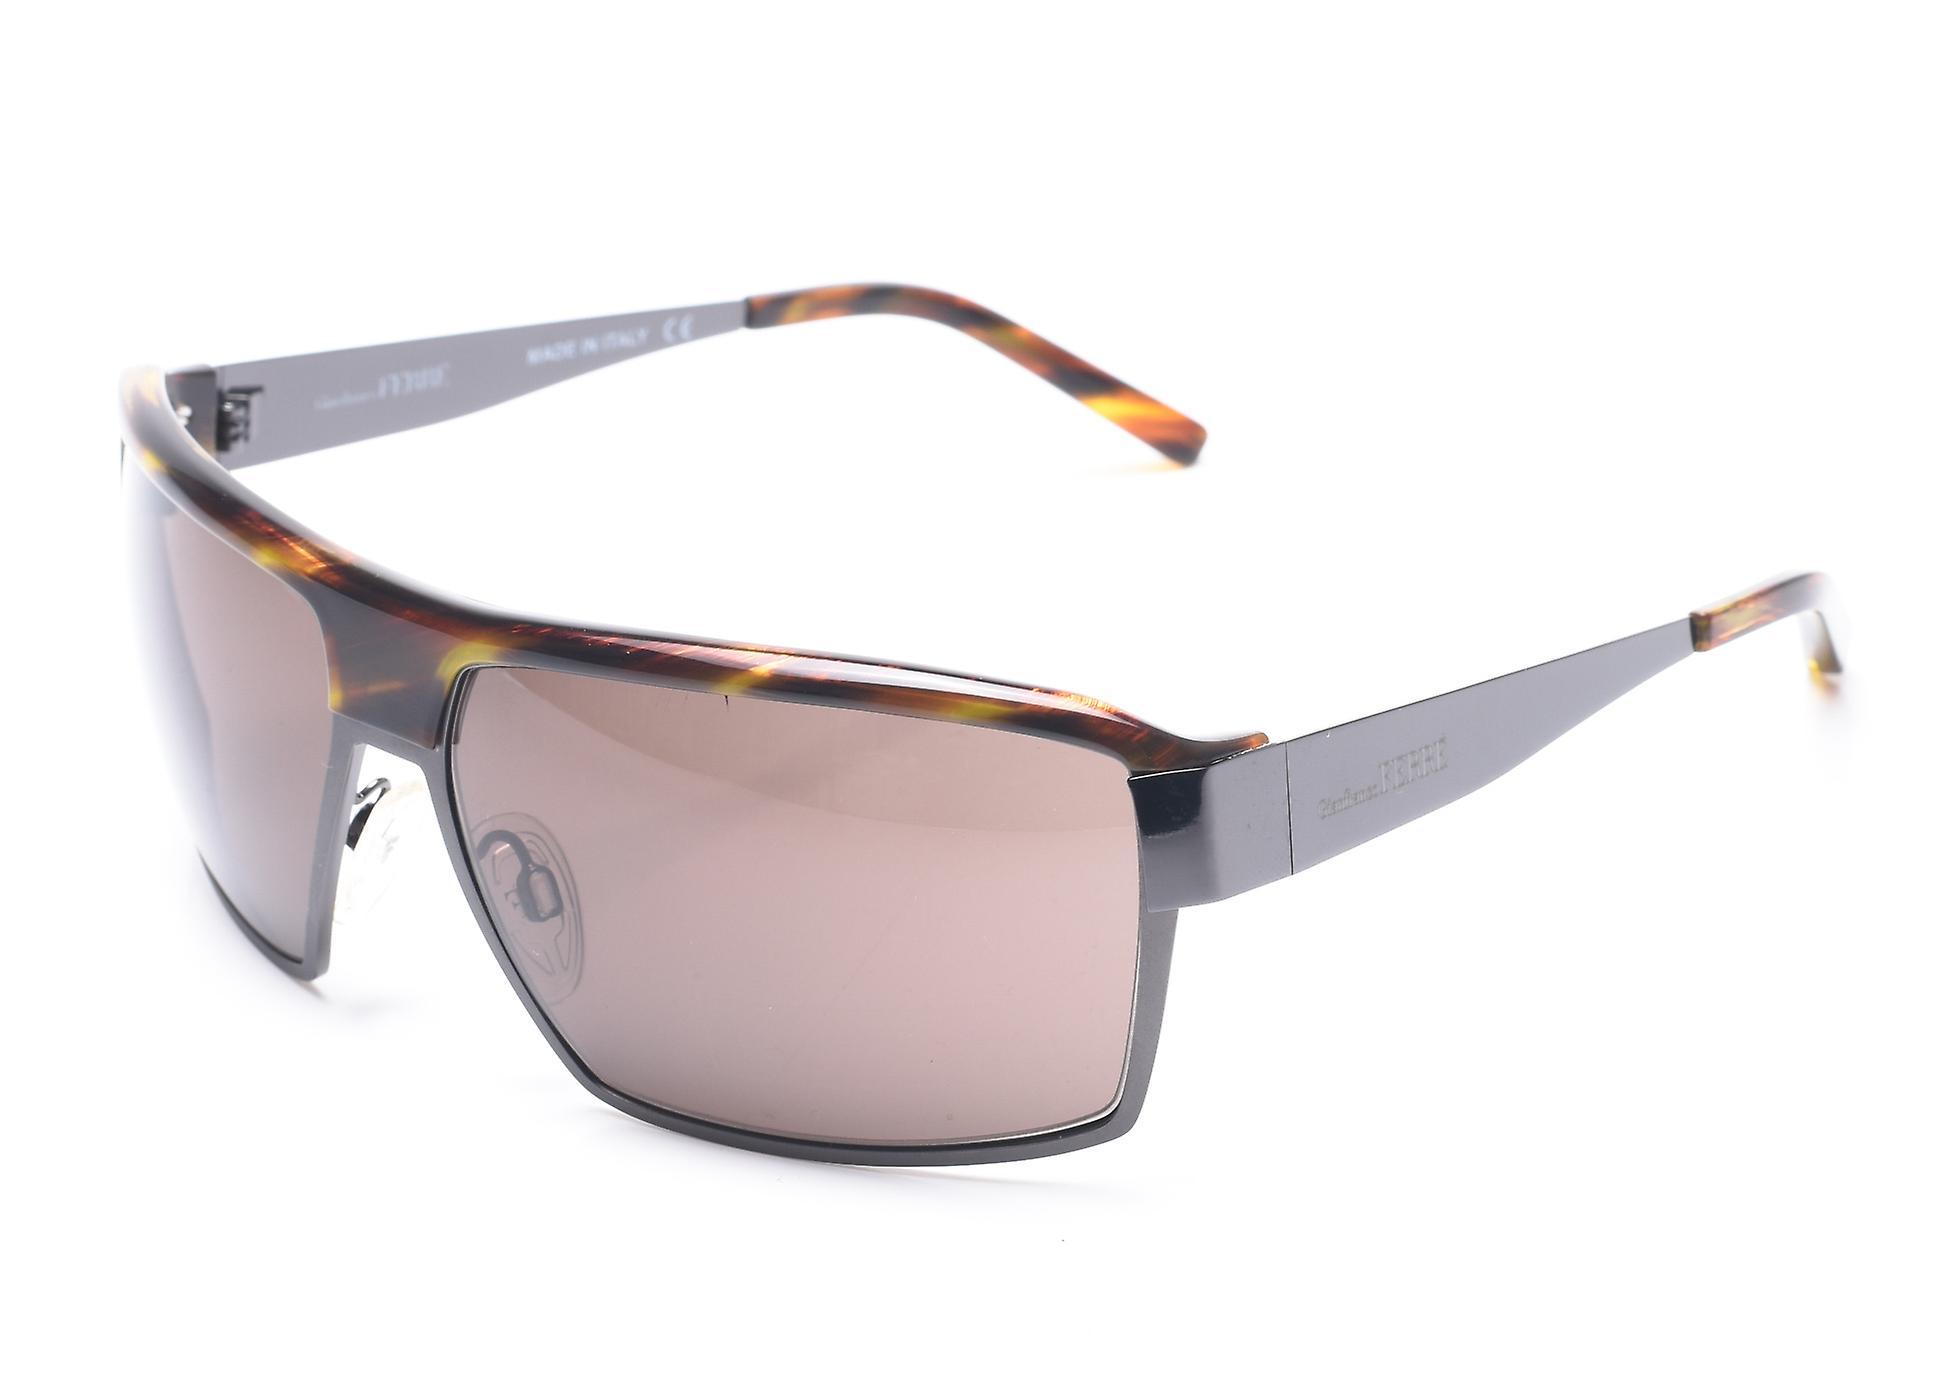 e09b7a1982c Gianfranco Ferre Women s Shield Sunglasses Black